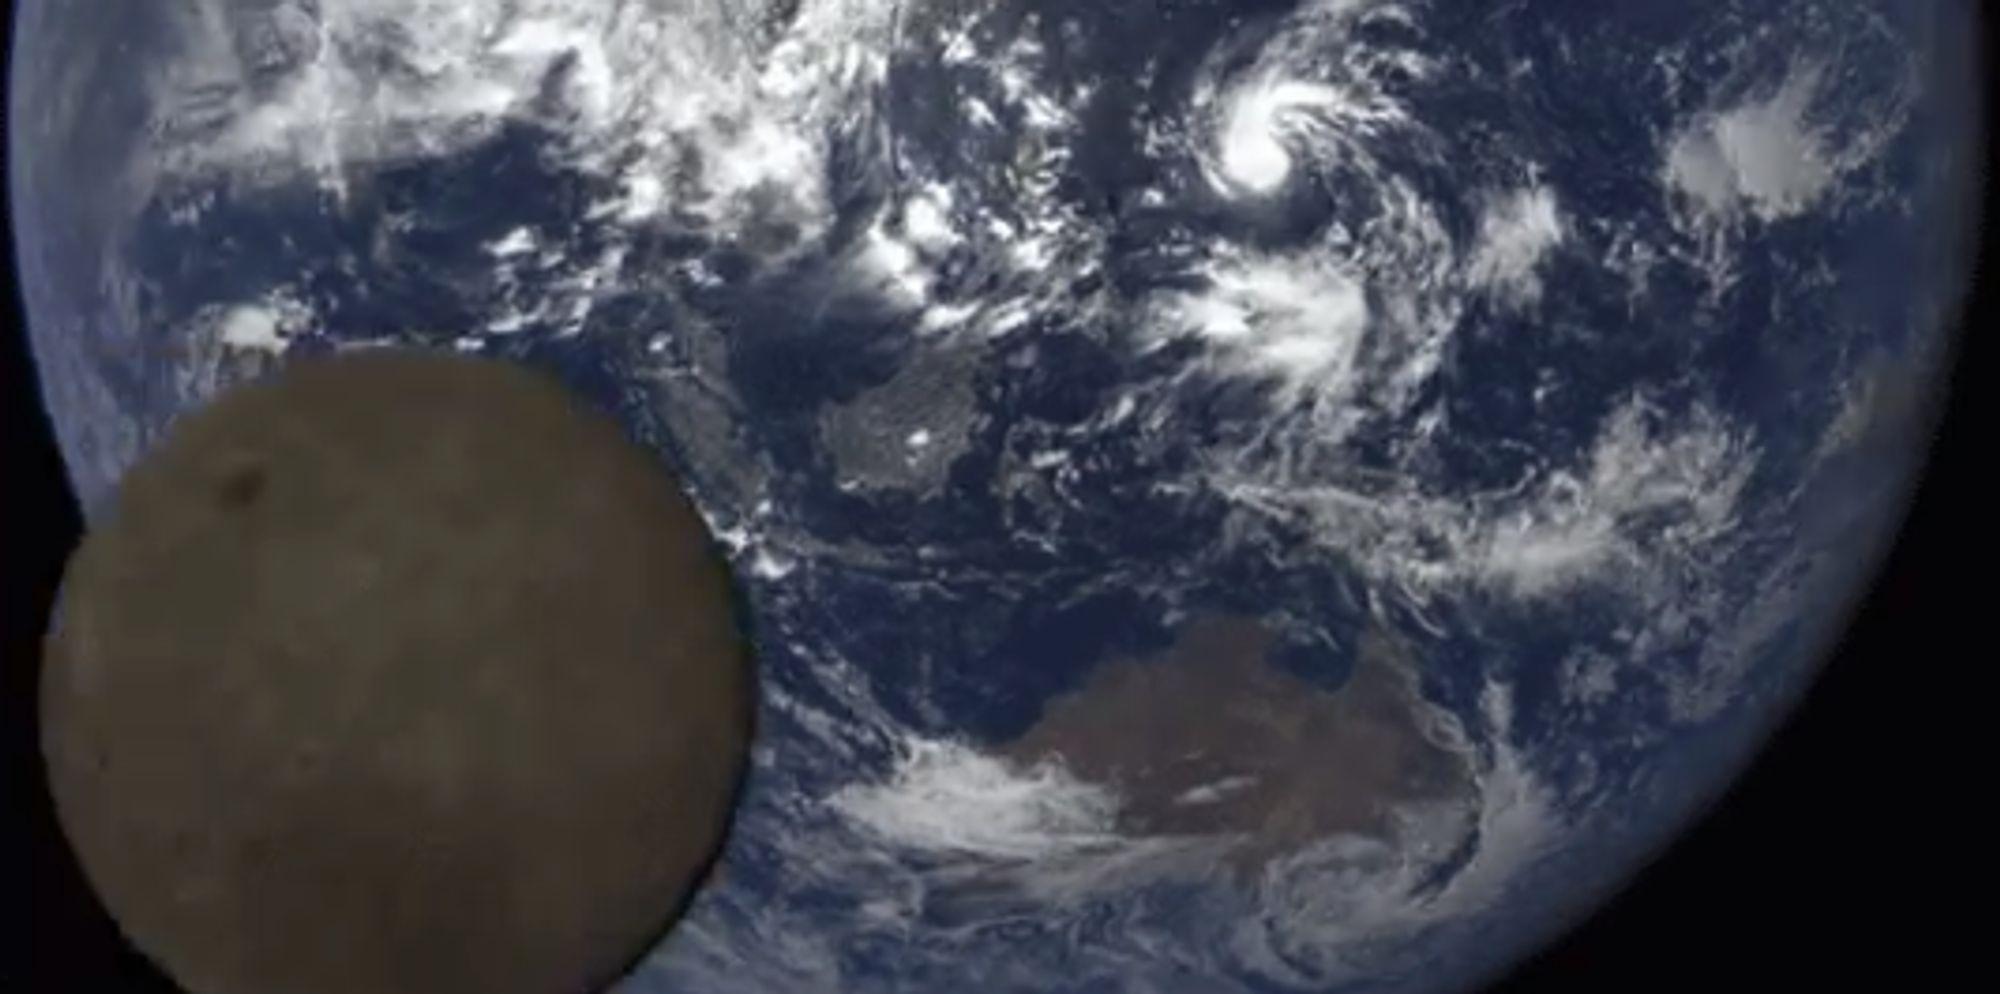 Watch The Moon Photobomb NASA's Spectacular Shot Of Earth